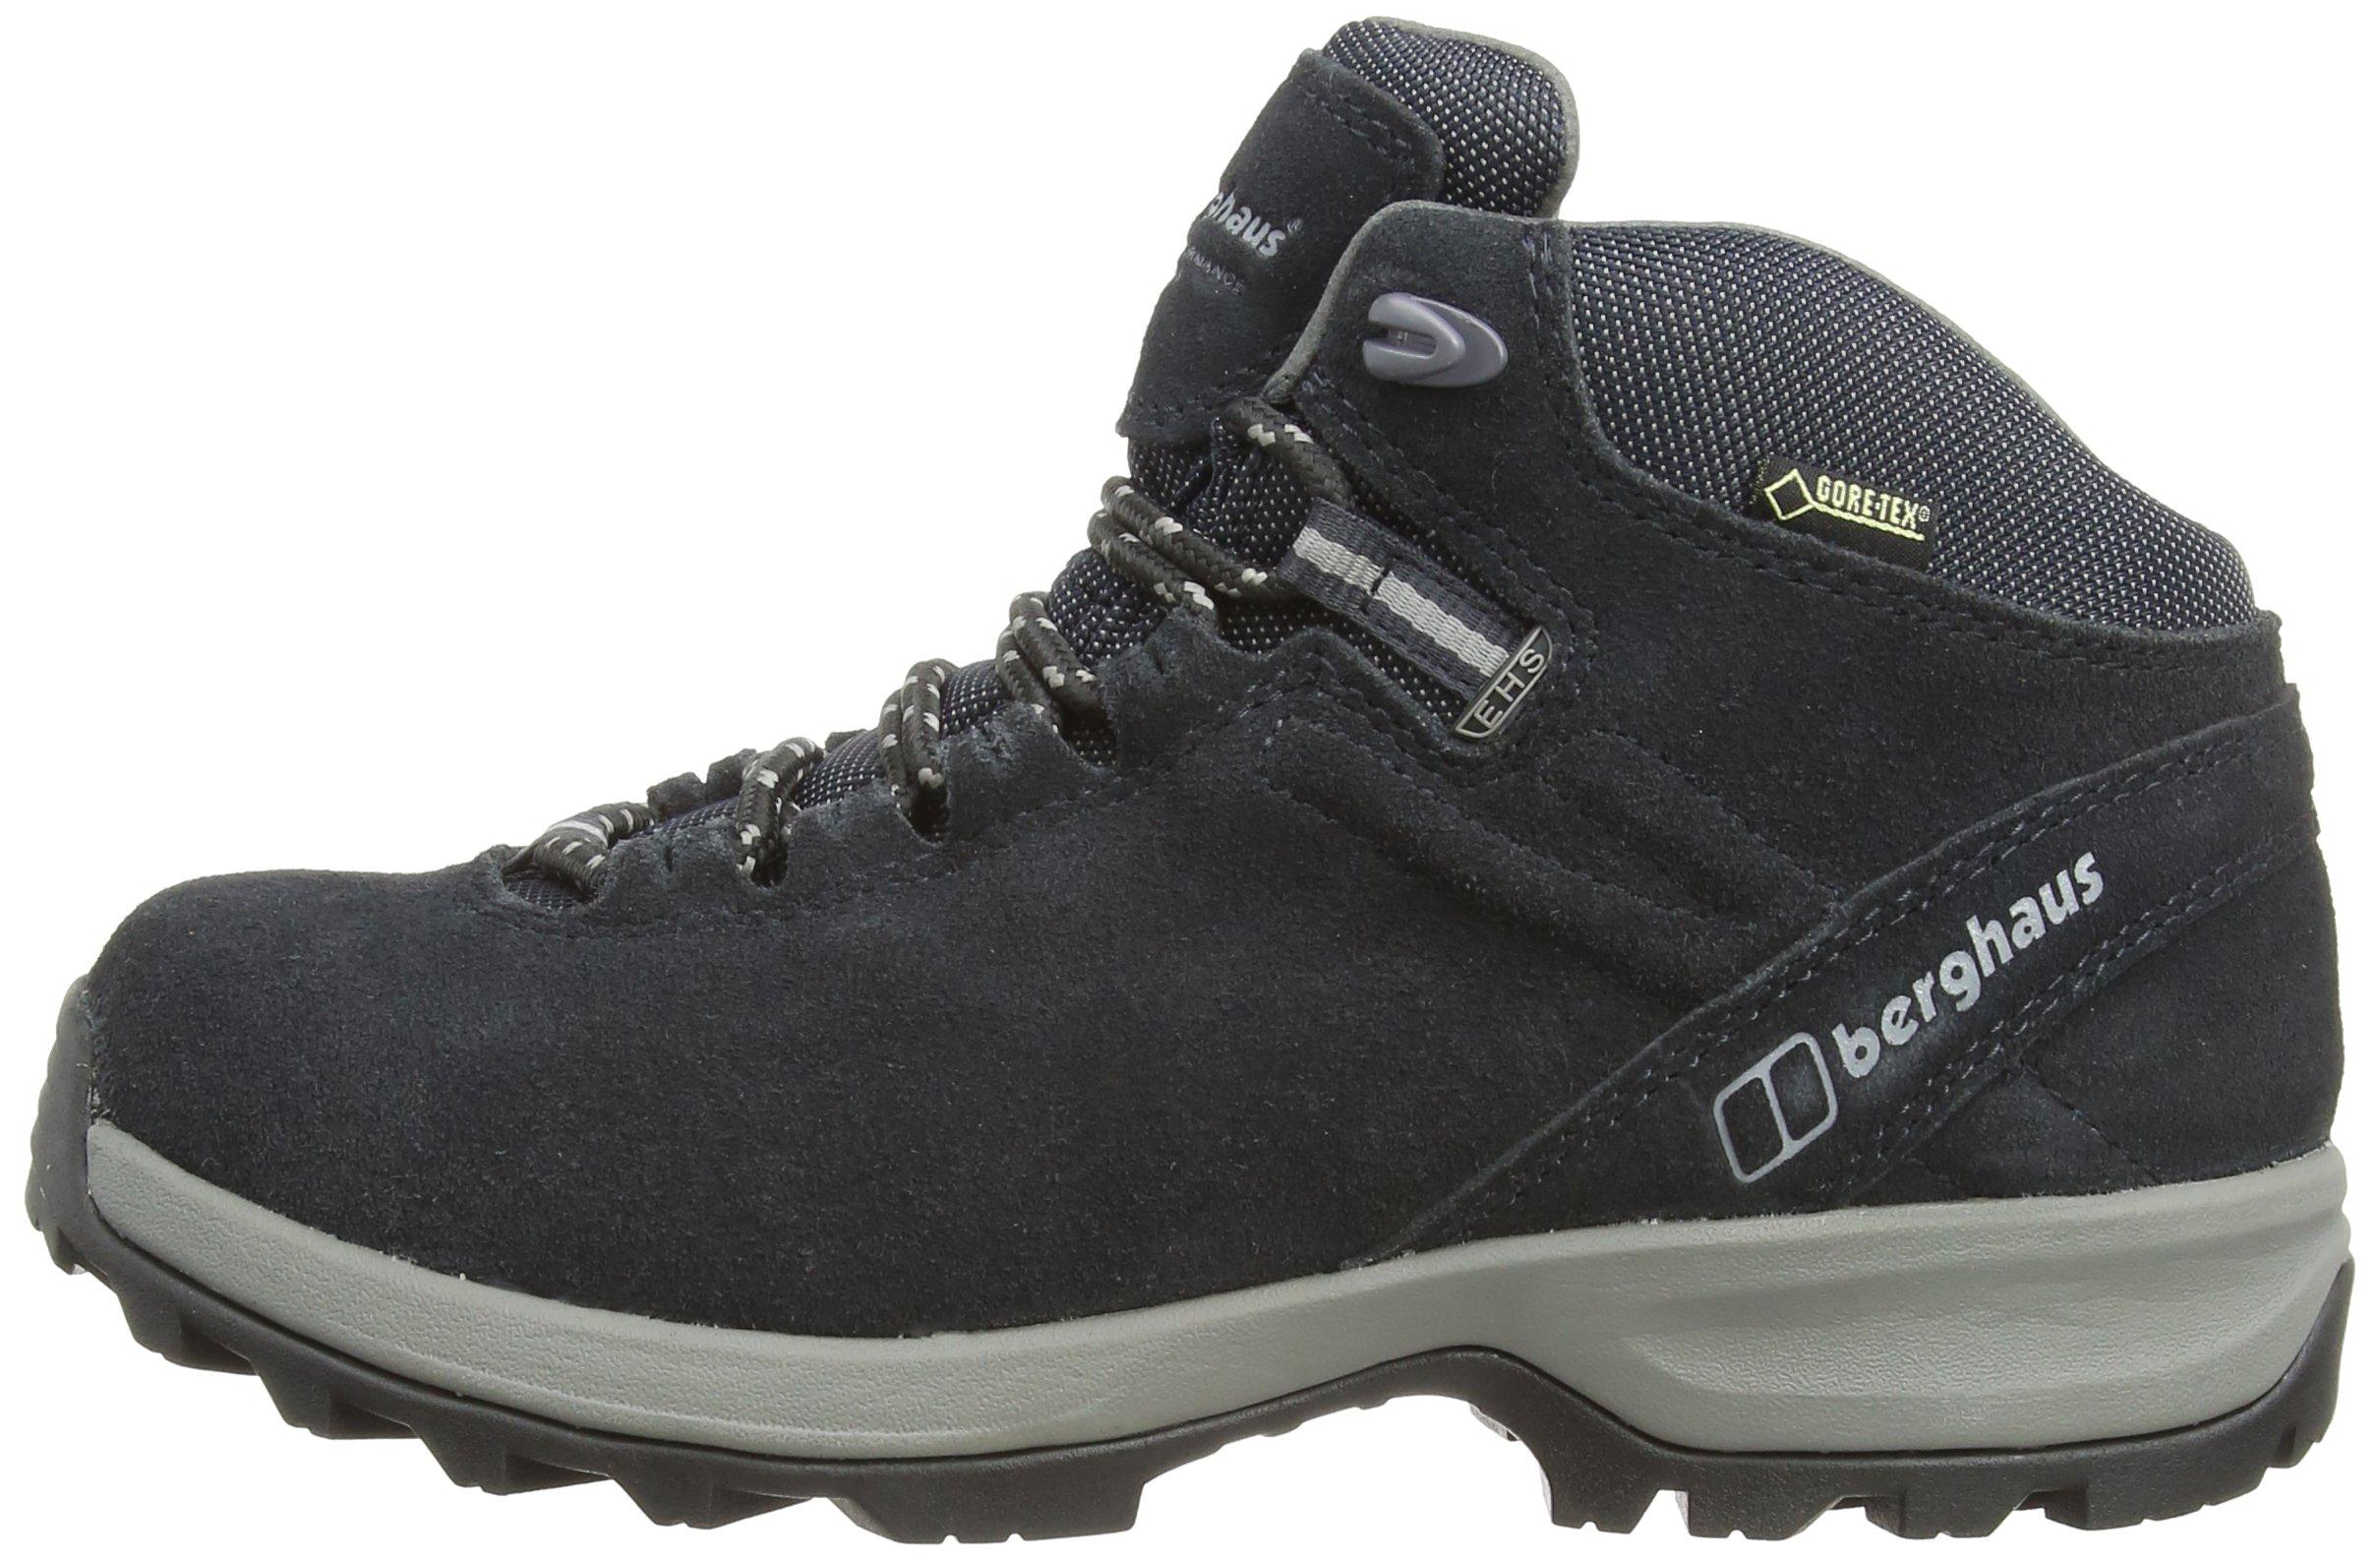 Berghaus Women's Explorer Trail Plus GTX Walking Boots 5